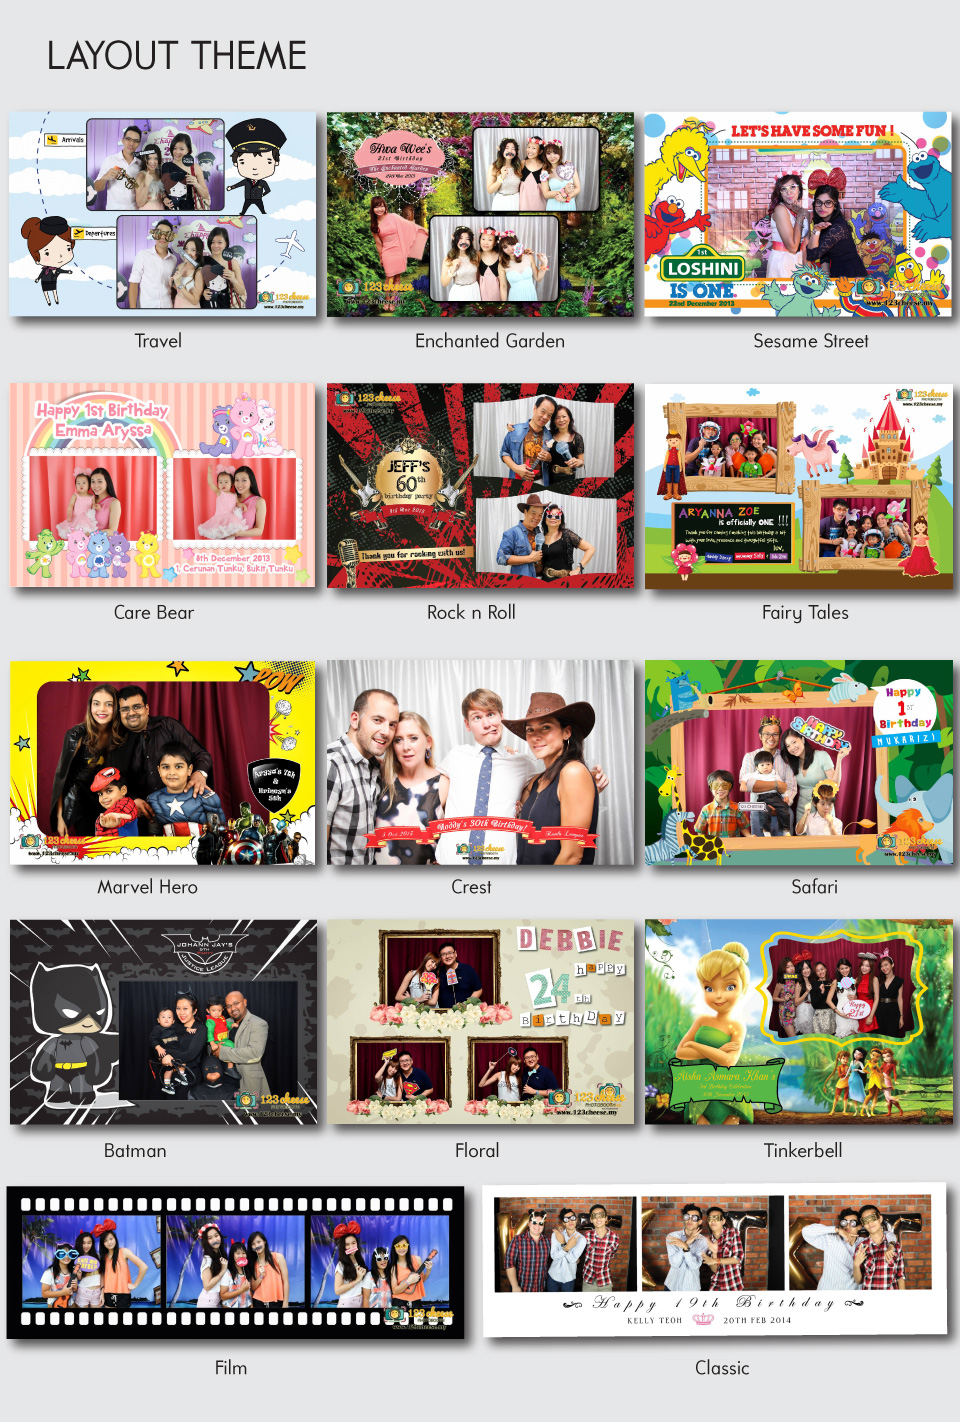 Website-layout-theme-(BIRTHDAY)